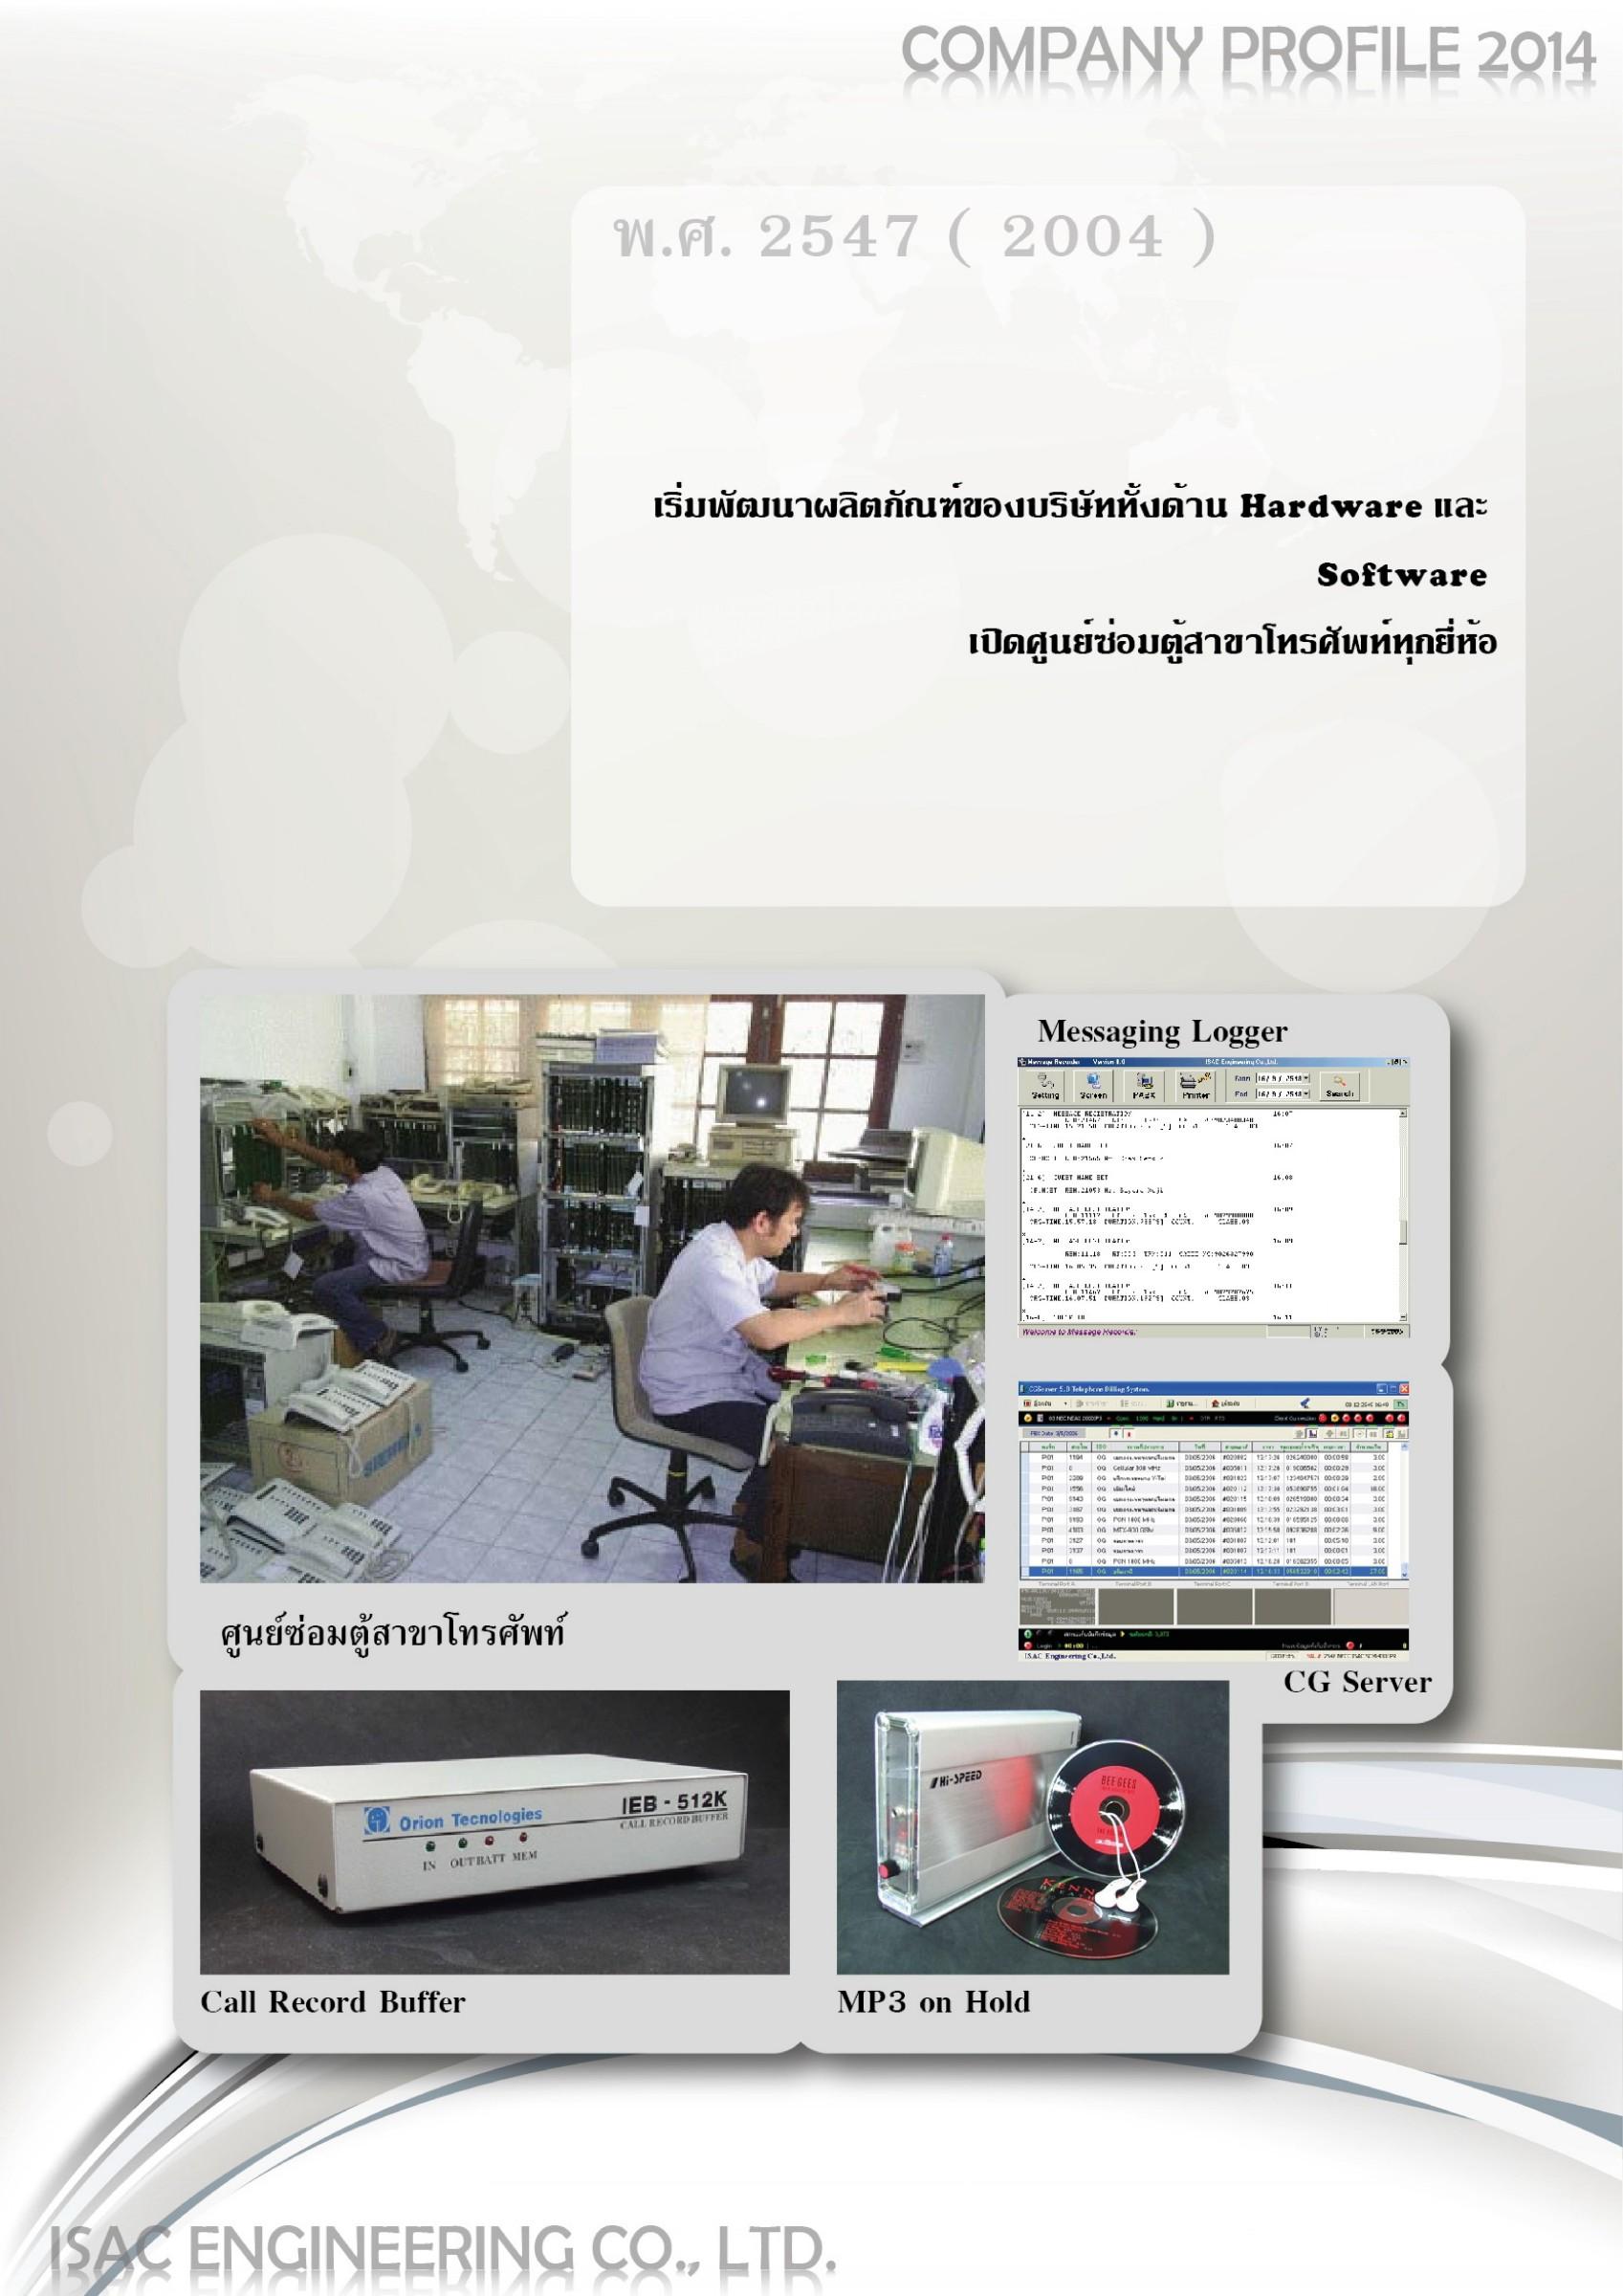 companyprofile2014-page-004